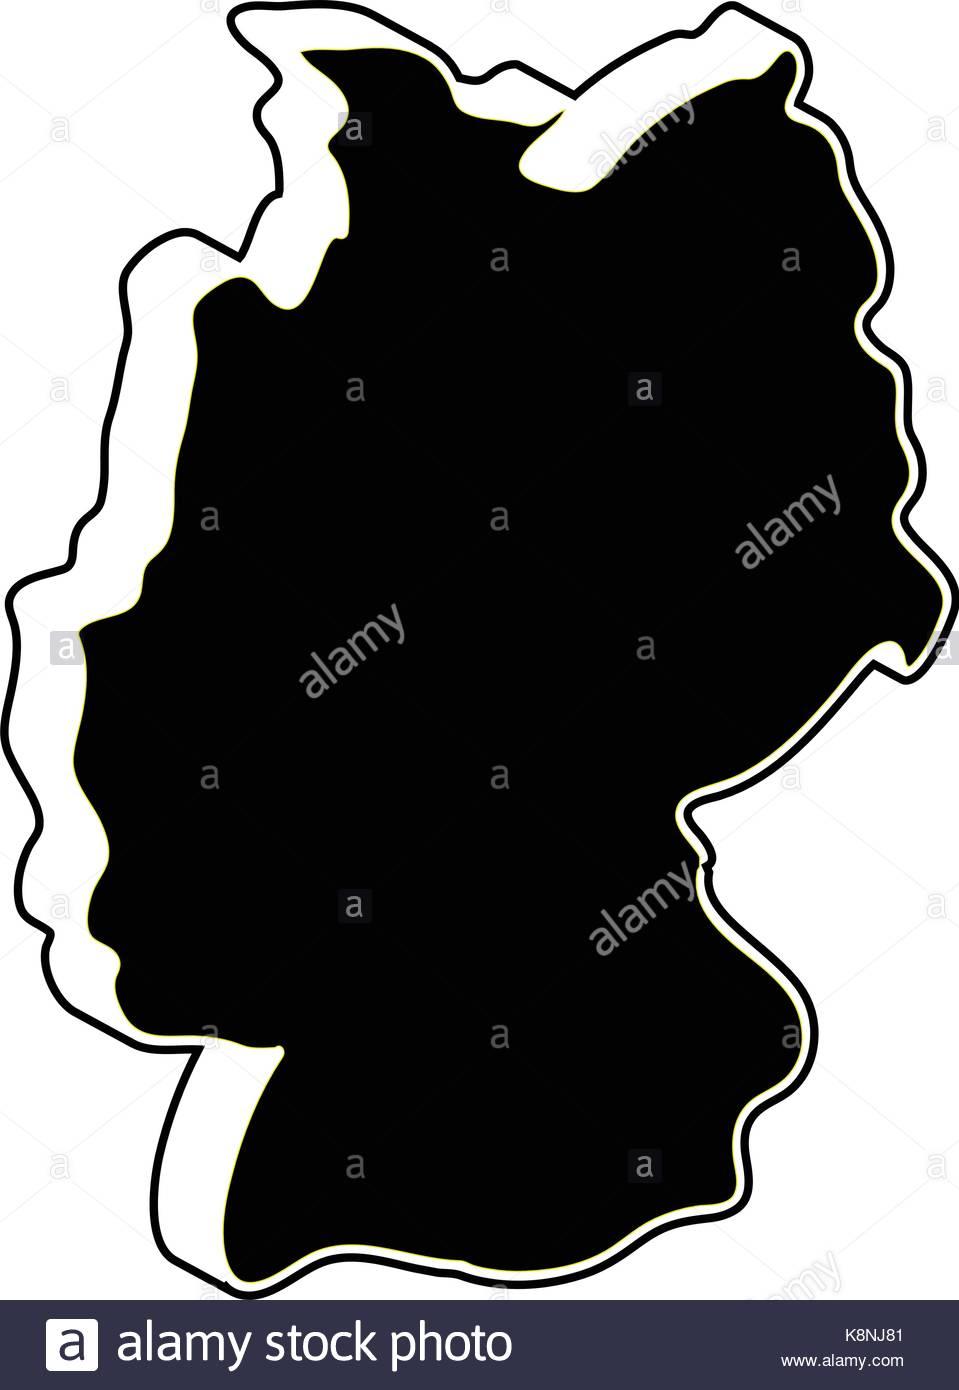 959x1390 Germany Map Vector Symbol Icon Design. Silhouette Illustration